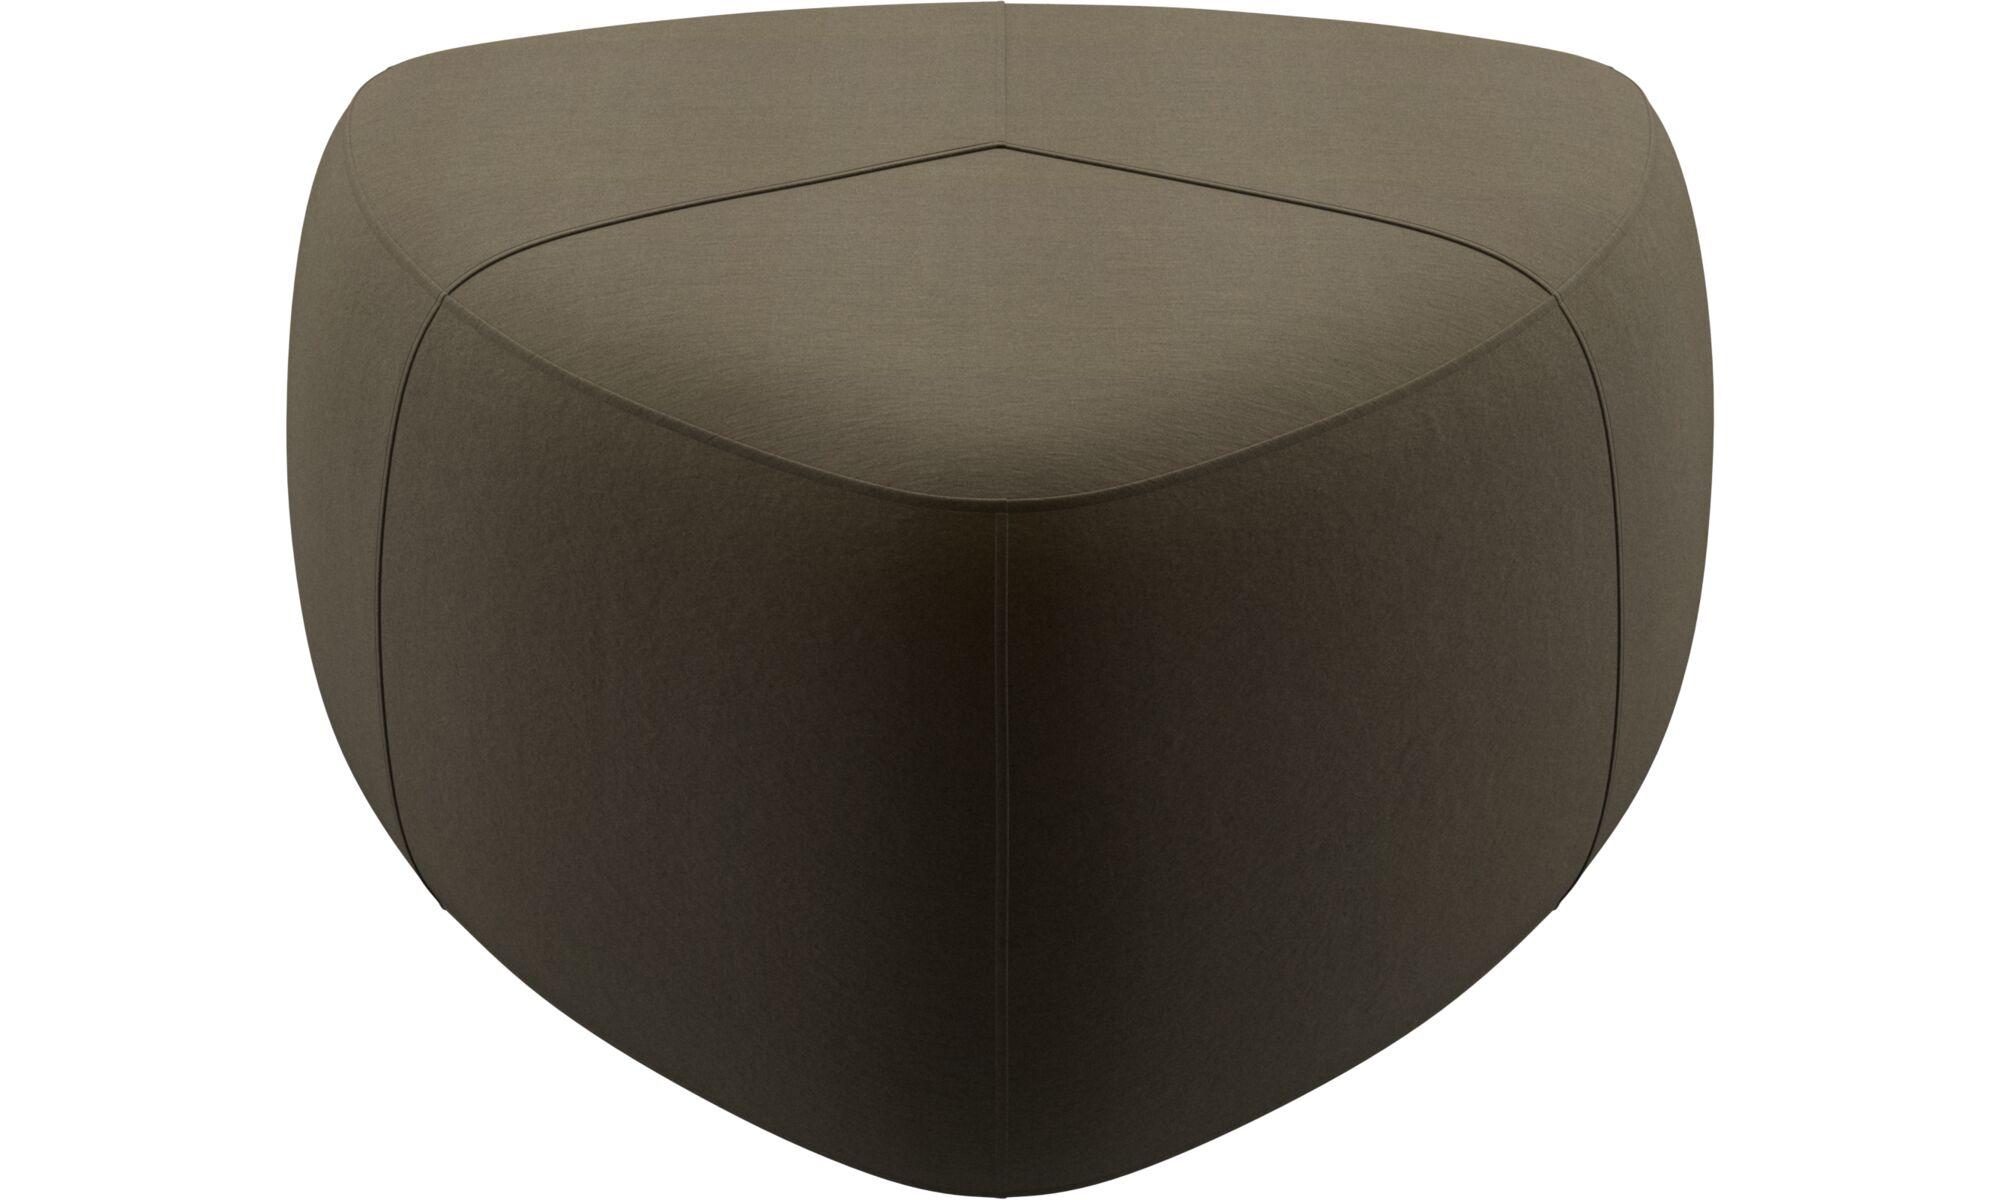 Footstools - Bermuda footstool - Brown - Fabric